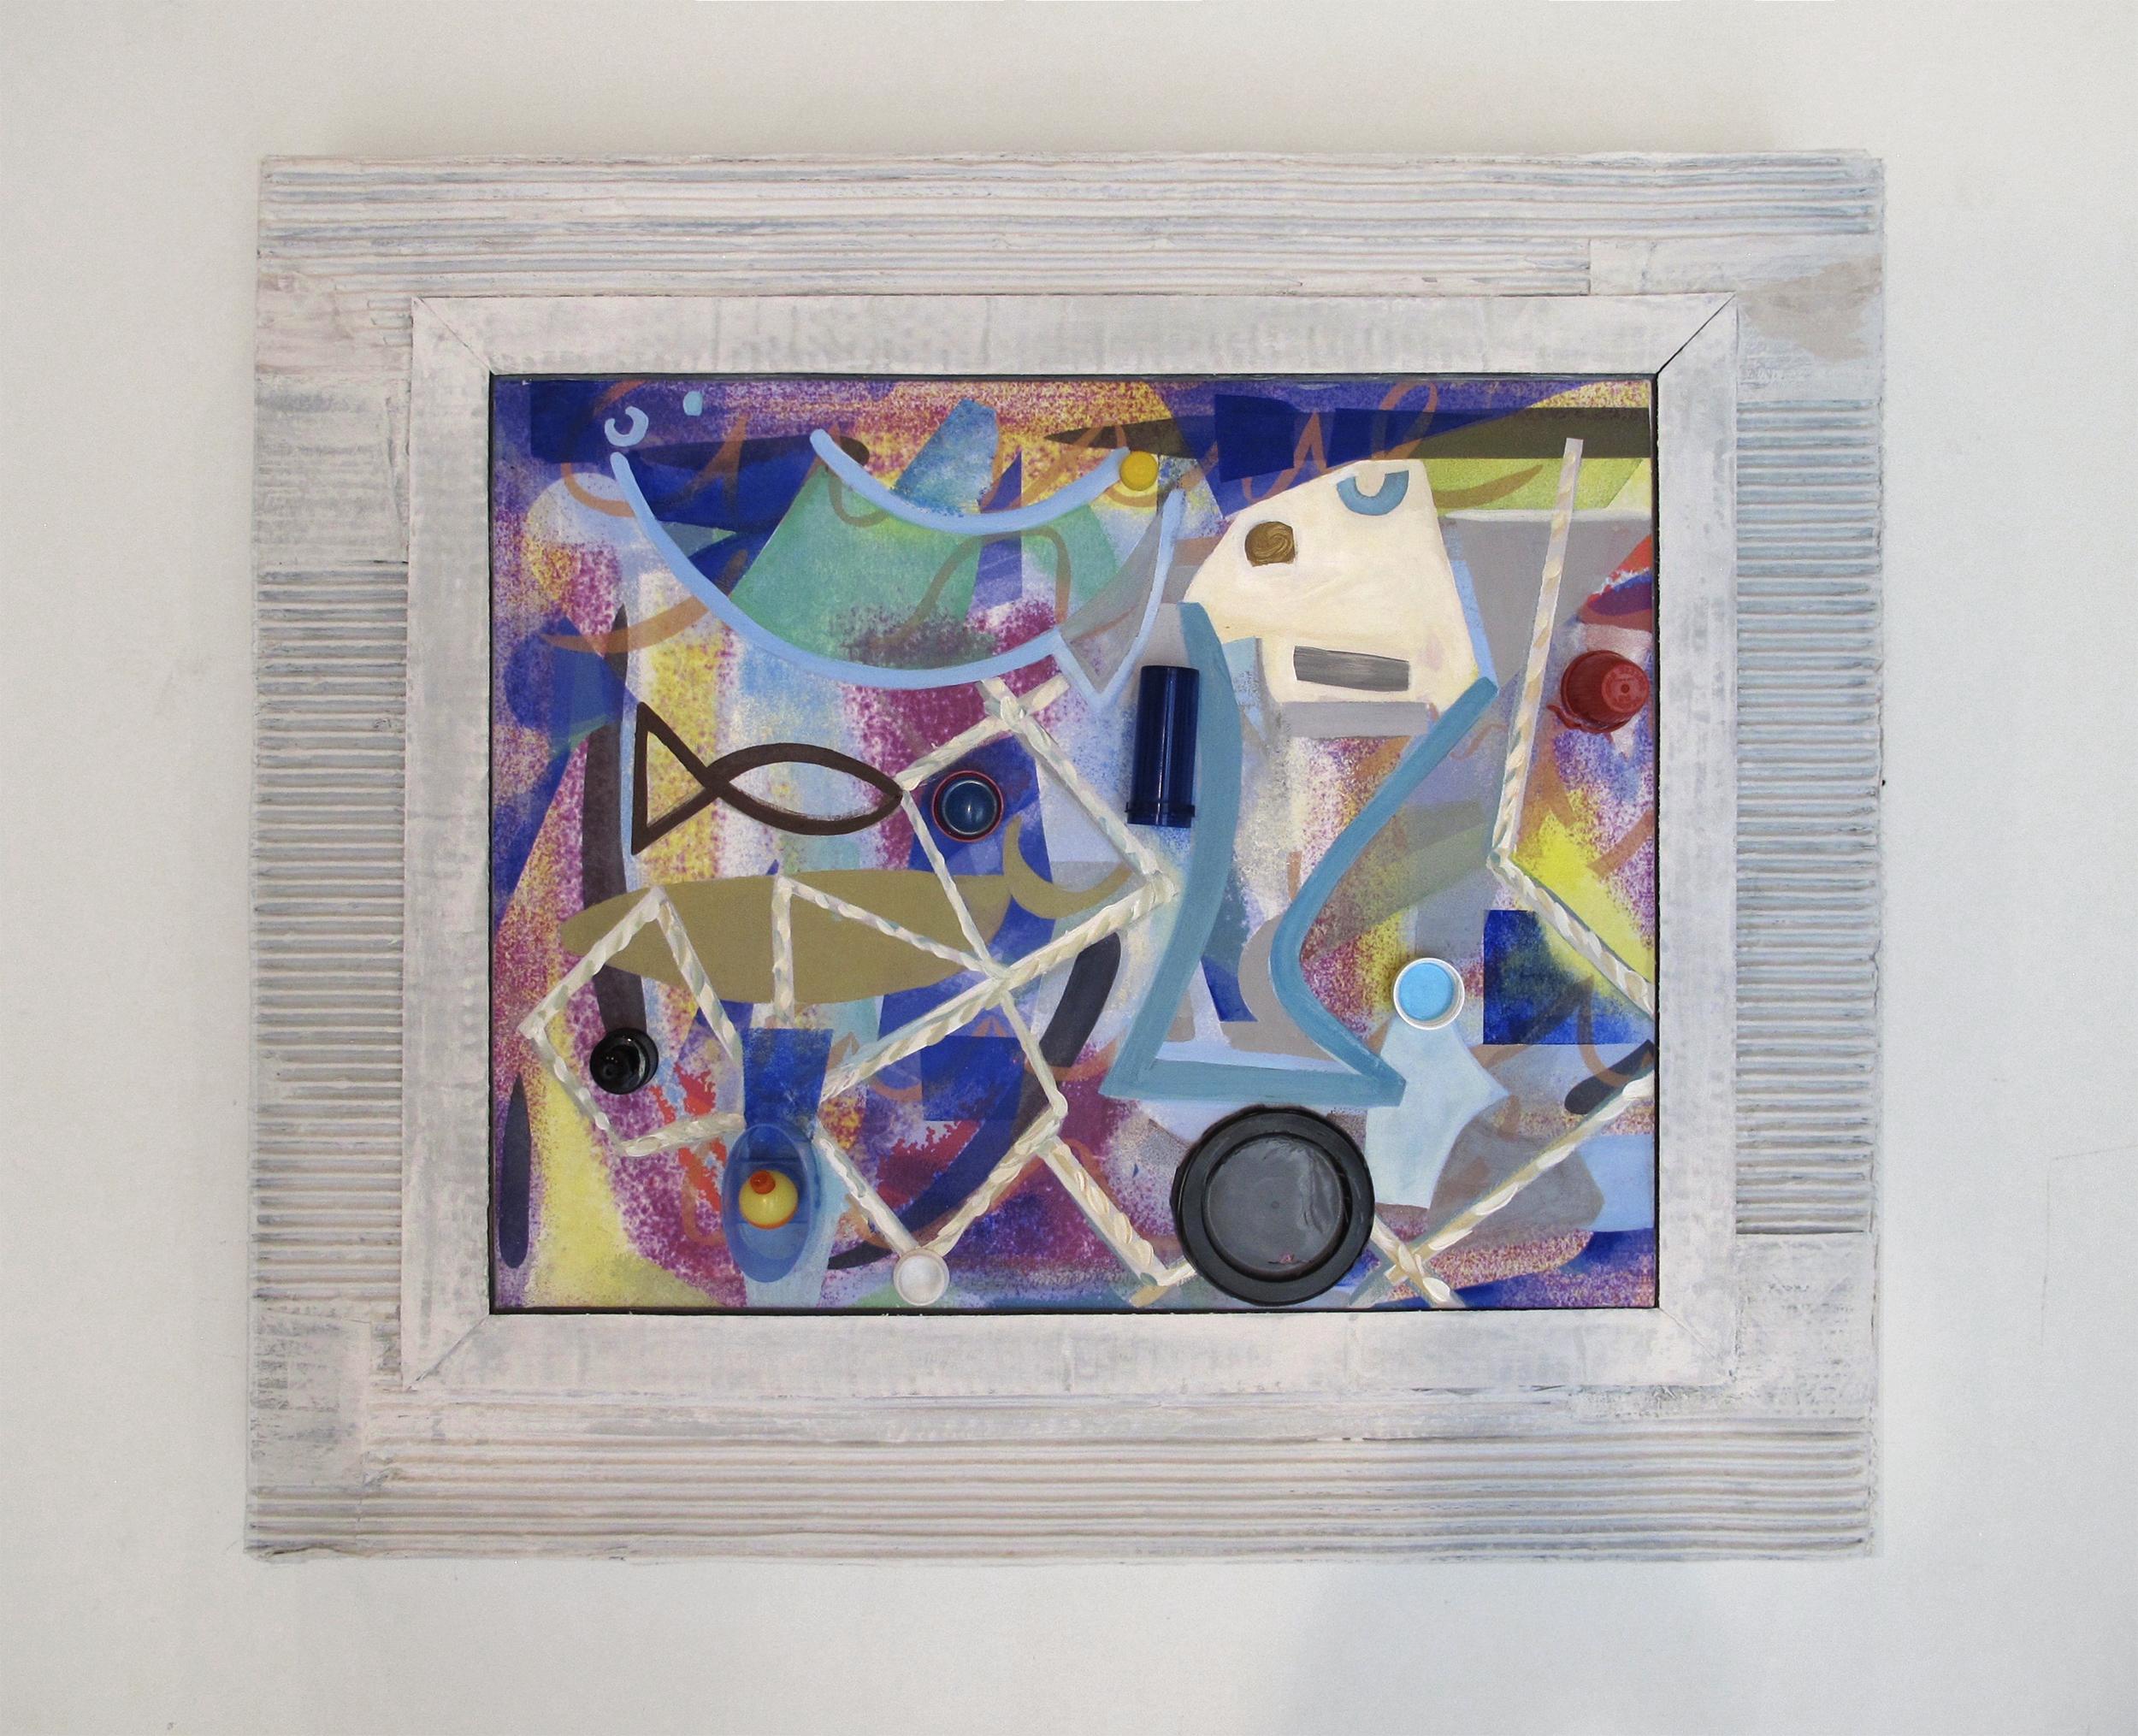 Simone-painting-MySushi.jpg